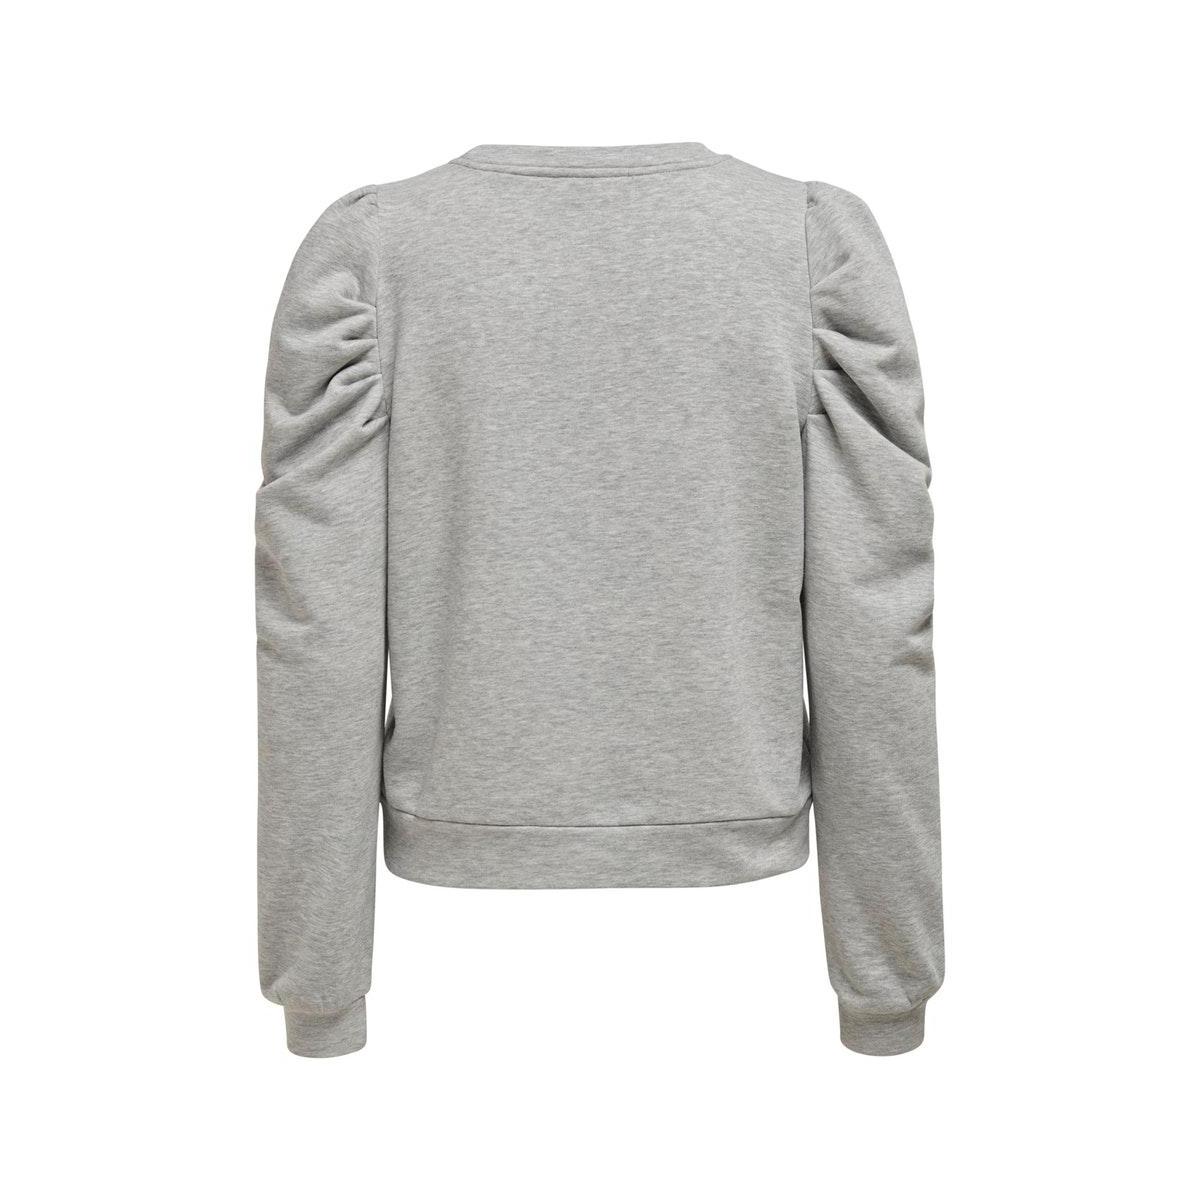 onldida l/s puff sweat 15208600 only sweater light grey melange